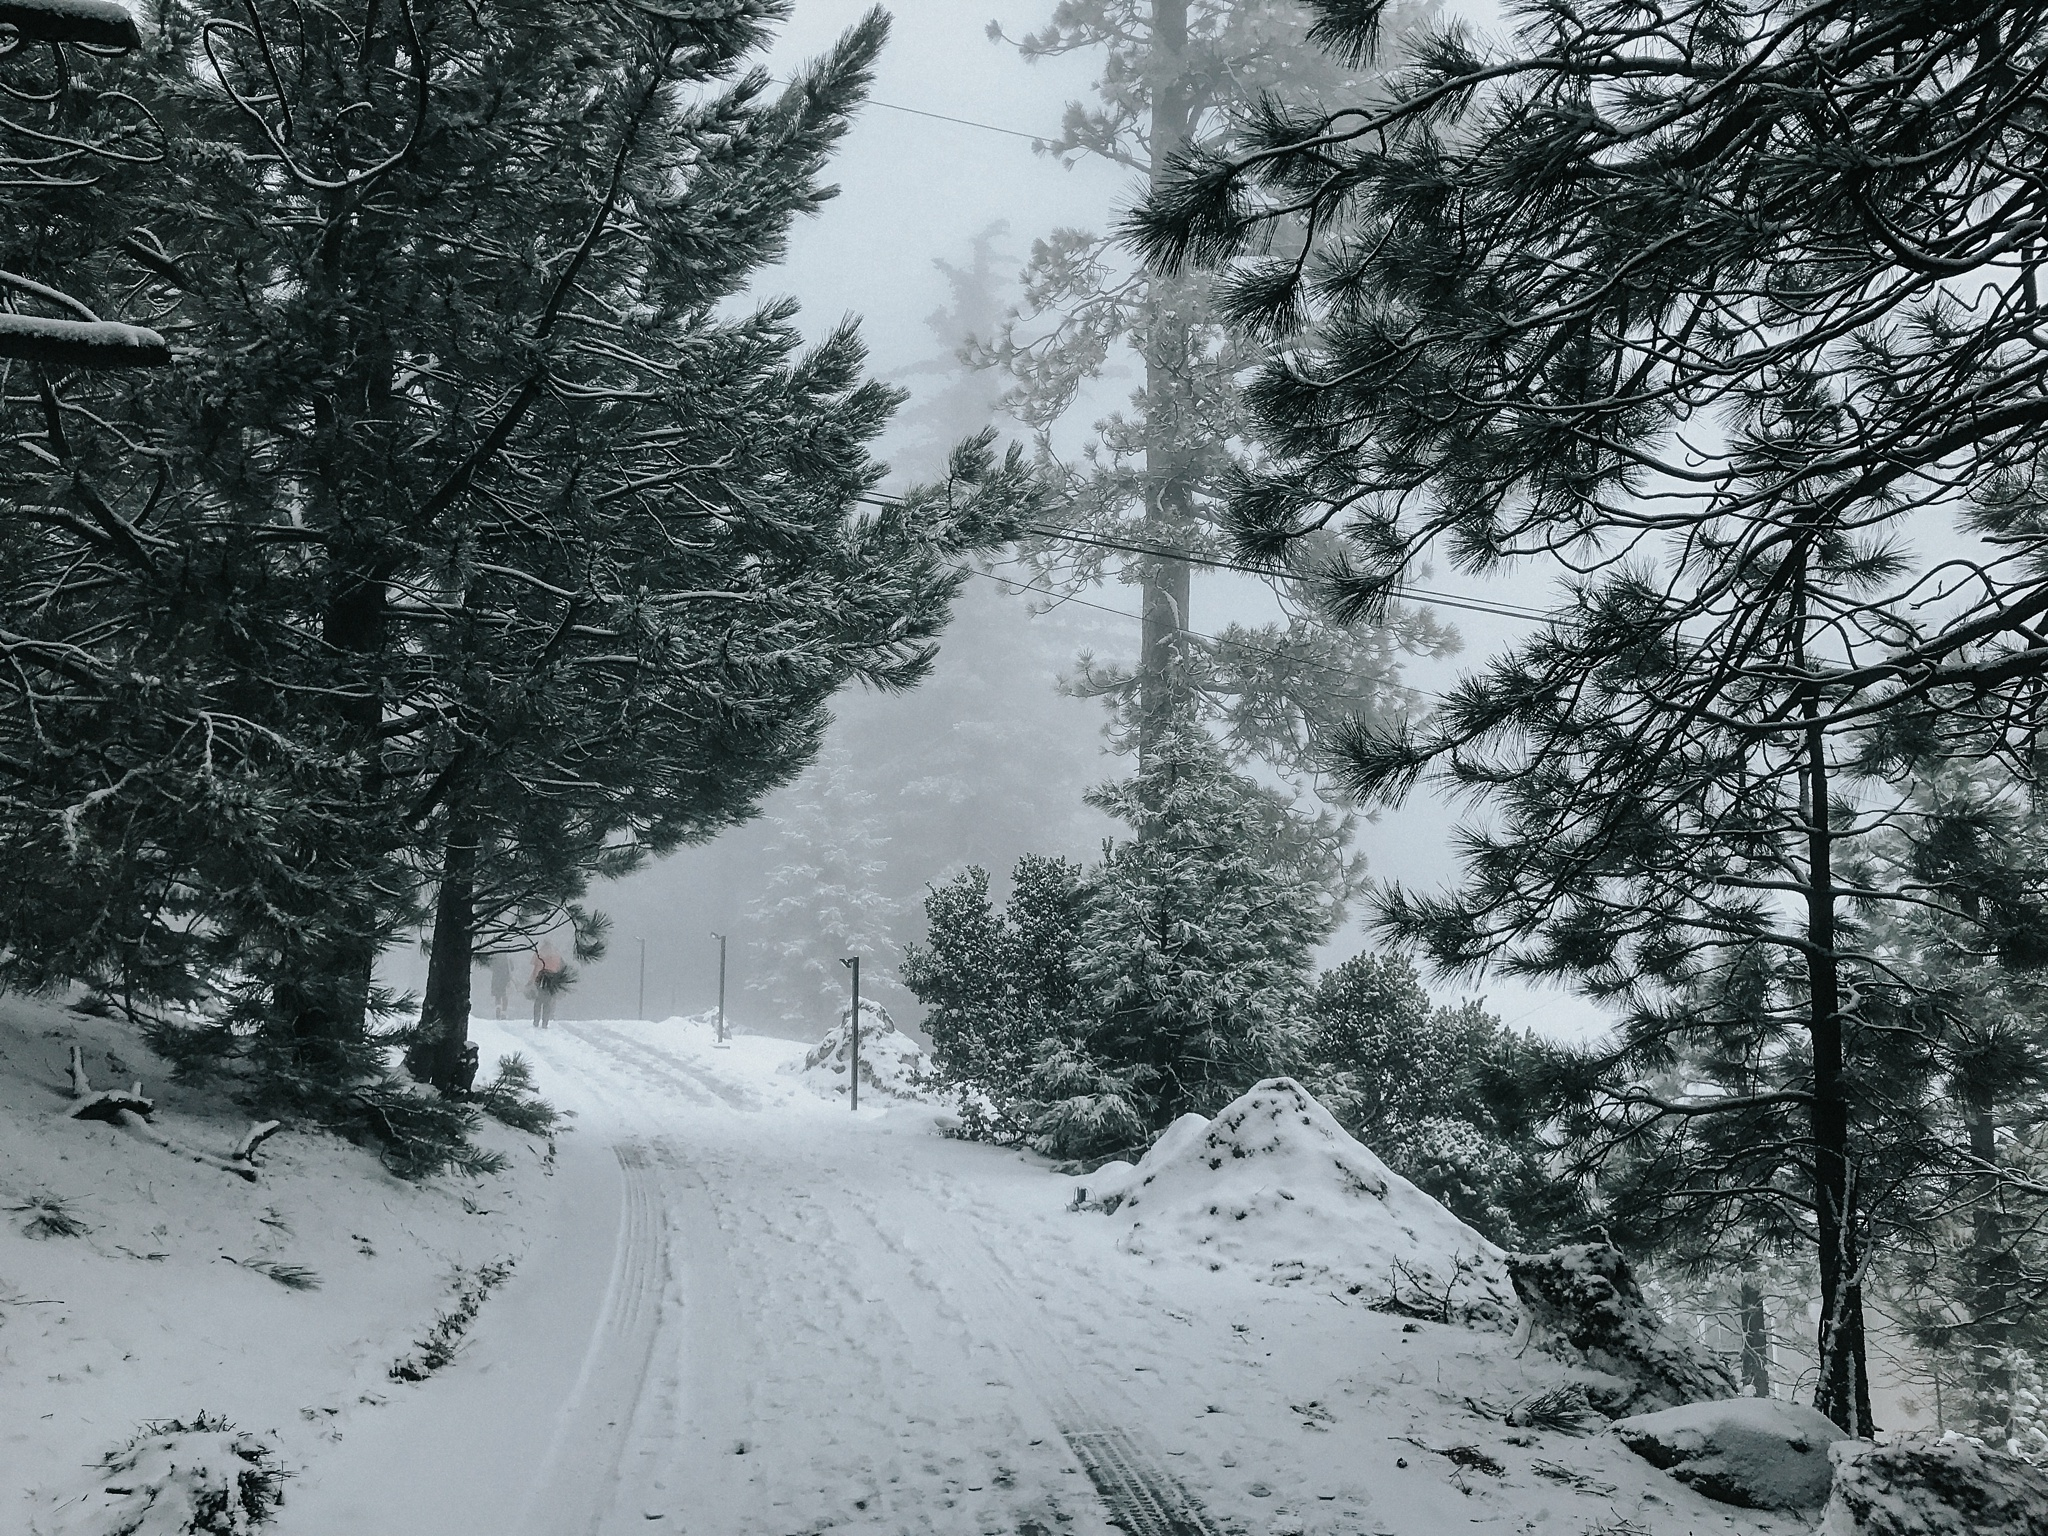 Leaving Field Trip and snowed in.